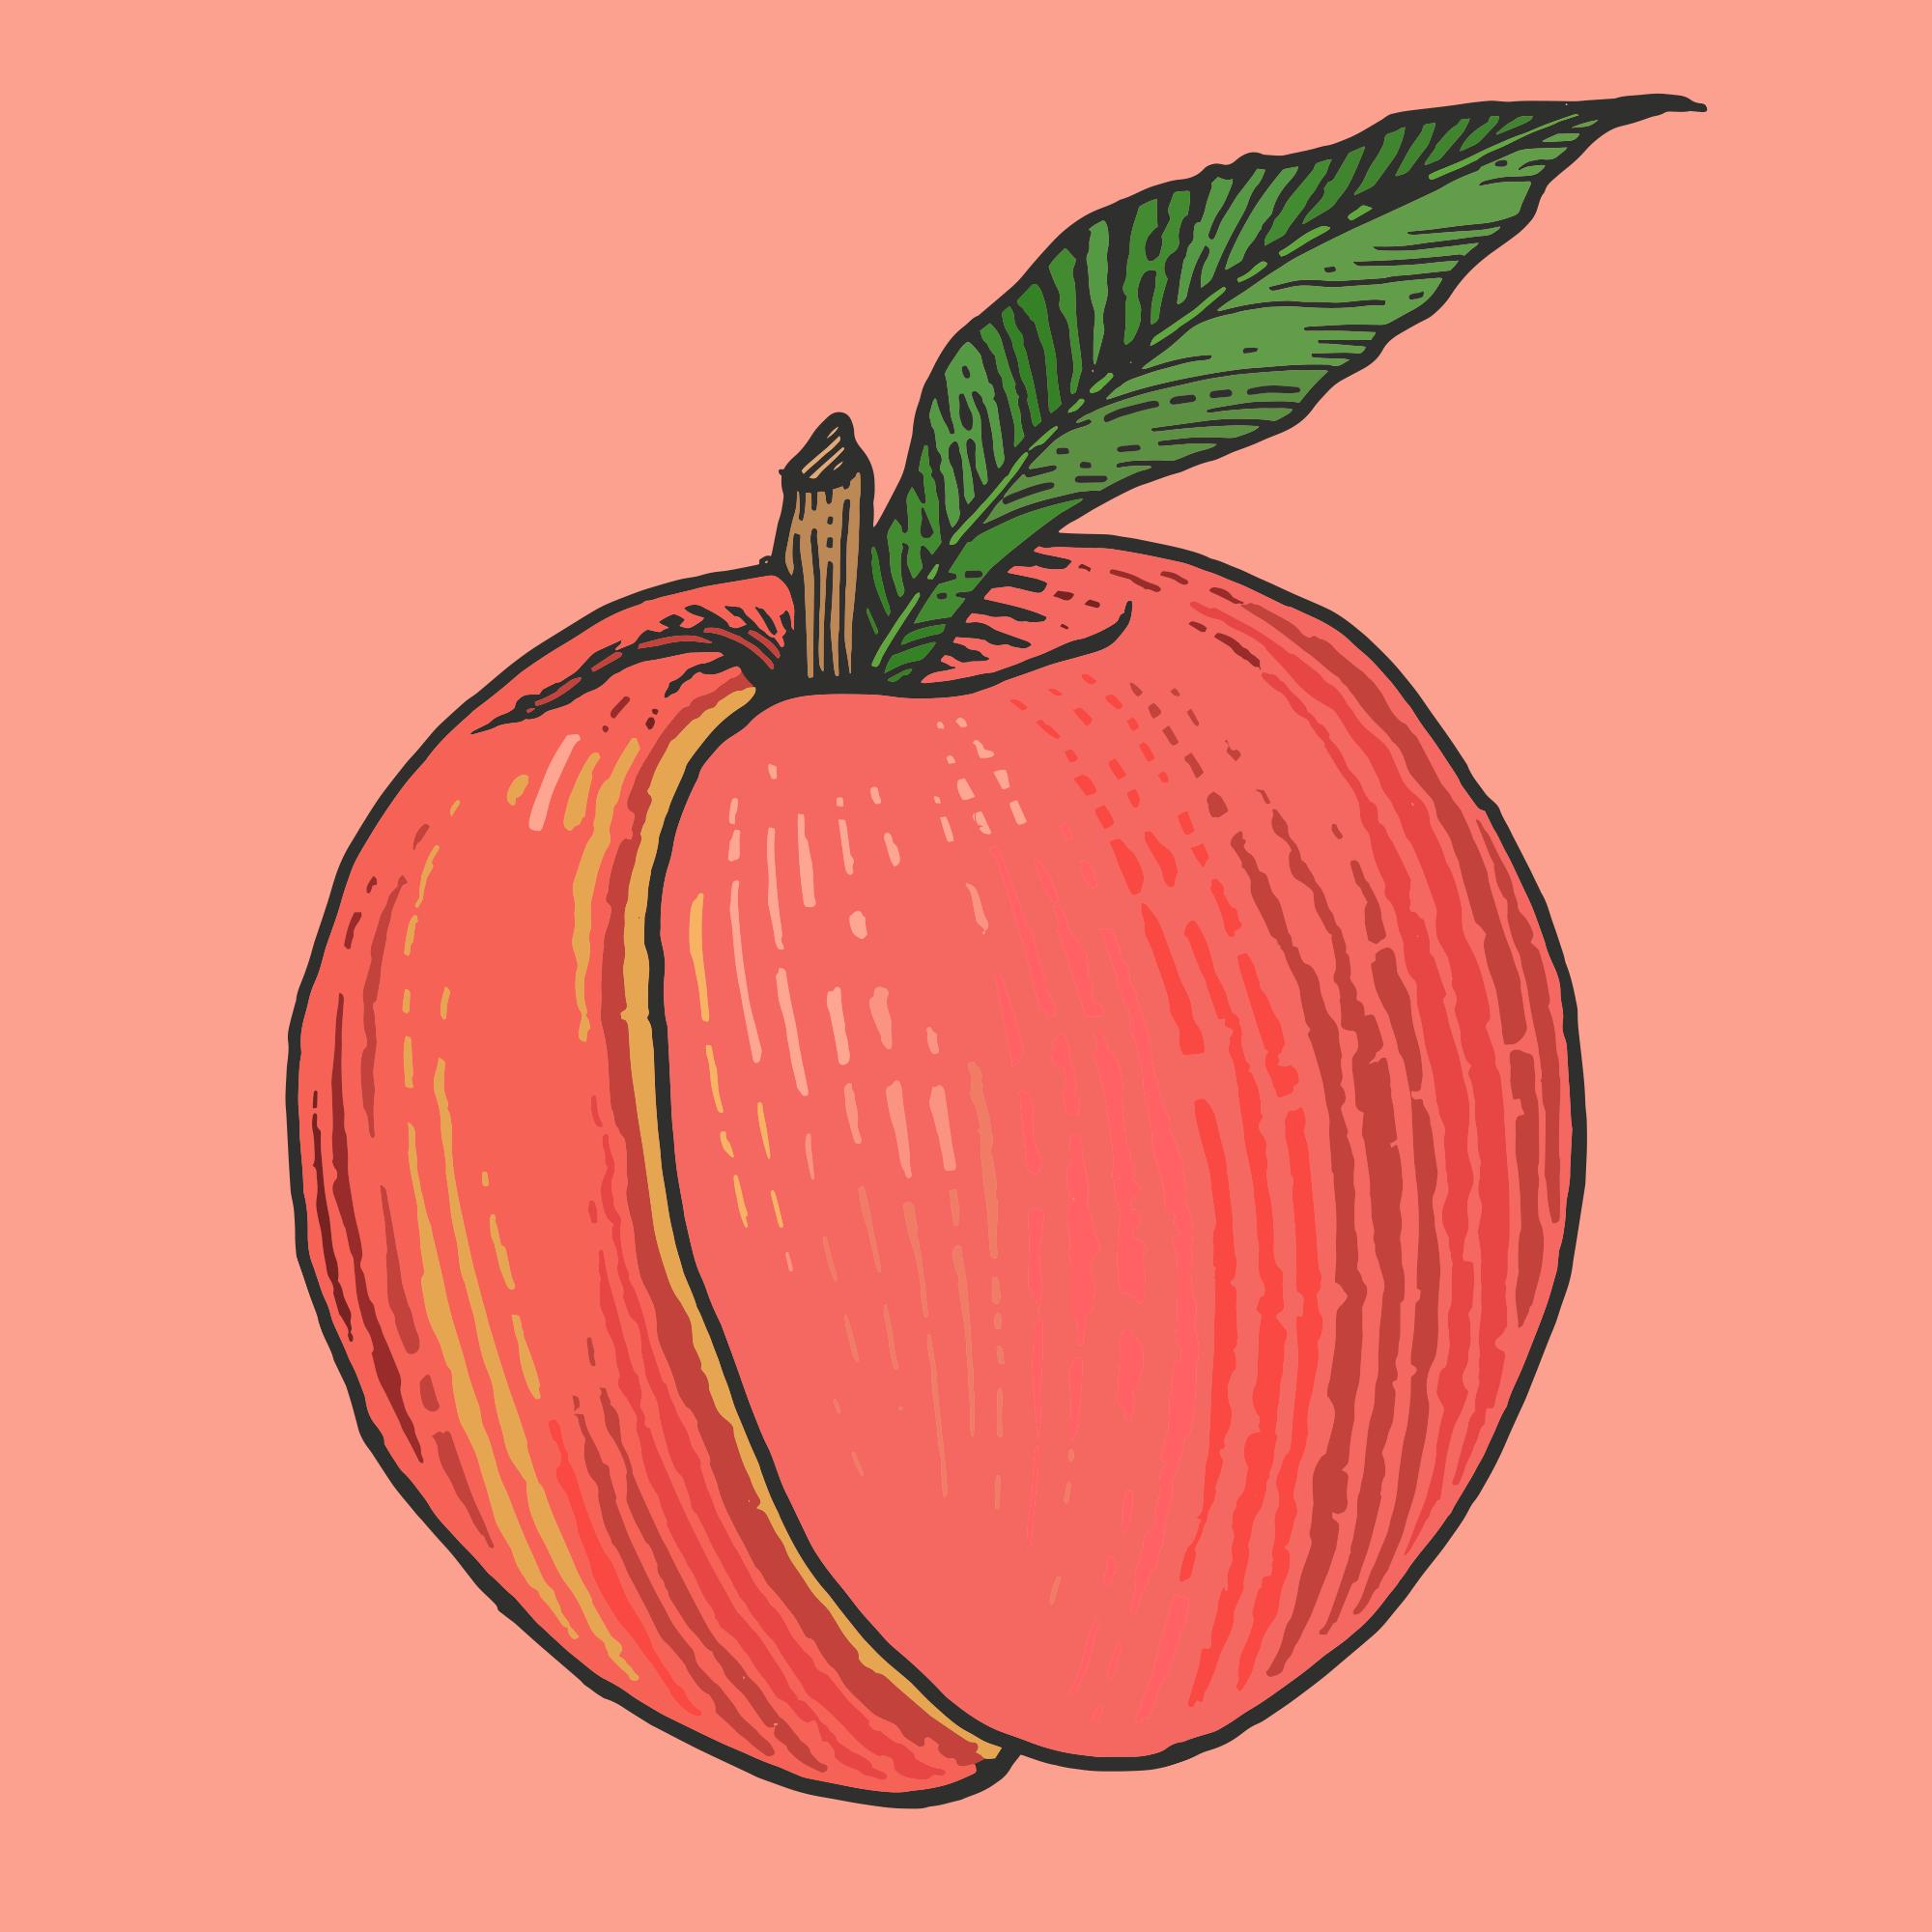 Peach 3.png